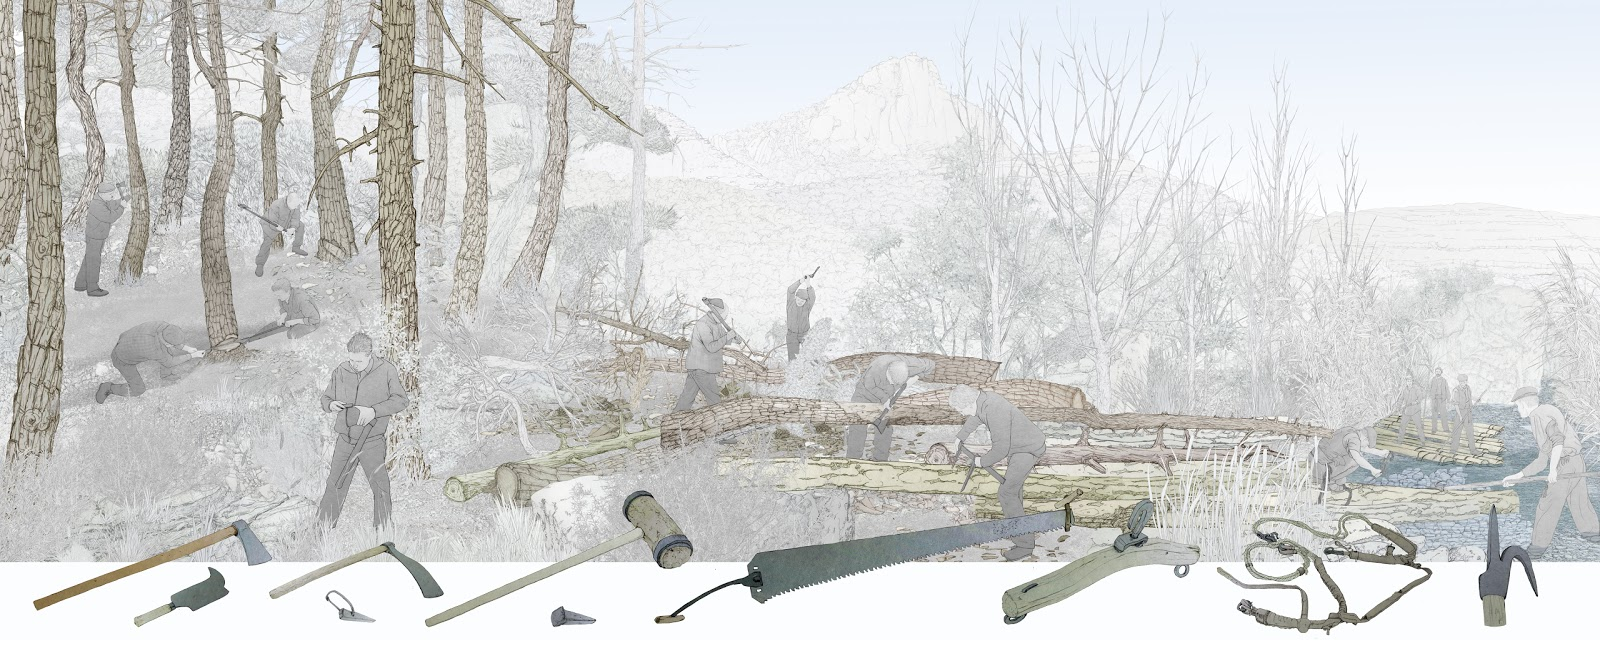 la tala del bosque